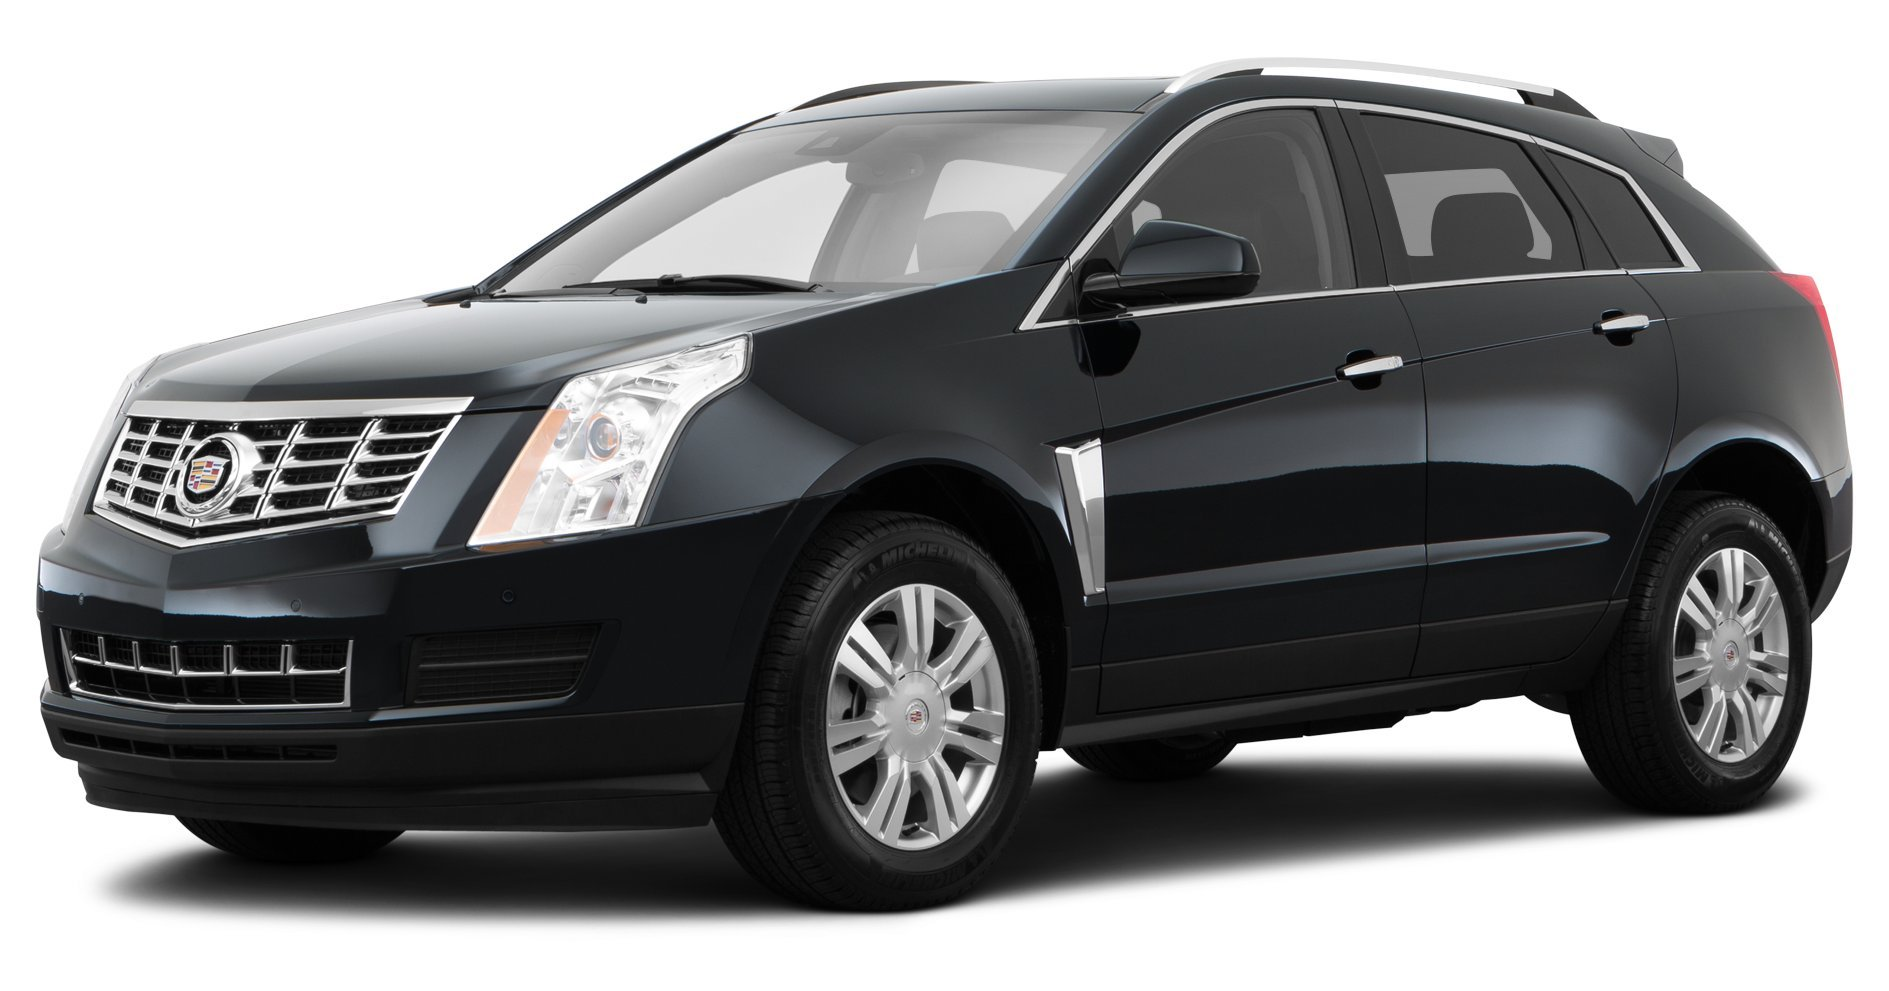 Amazon.com: 2015 Cadillac SRX Reviews, Images, and Specs: Vehicles